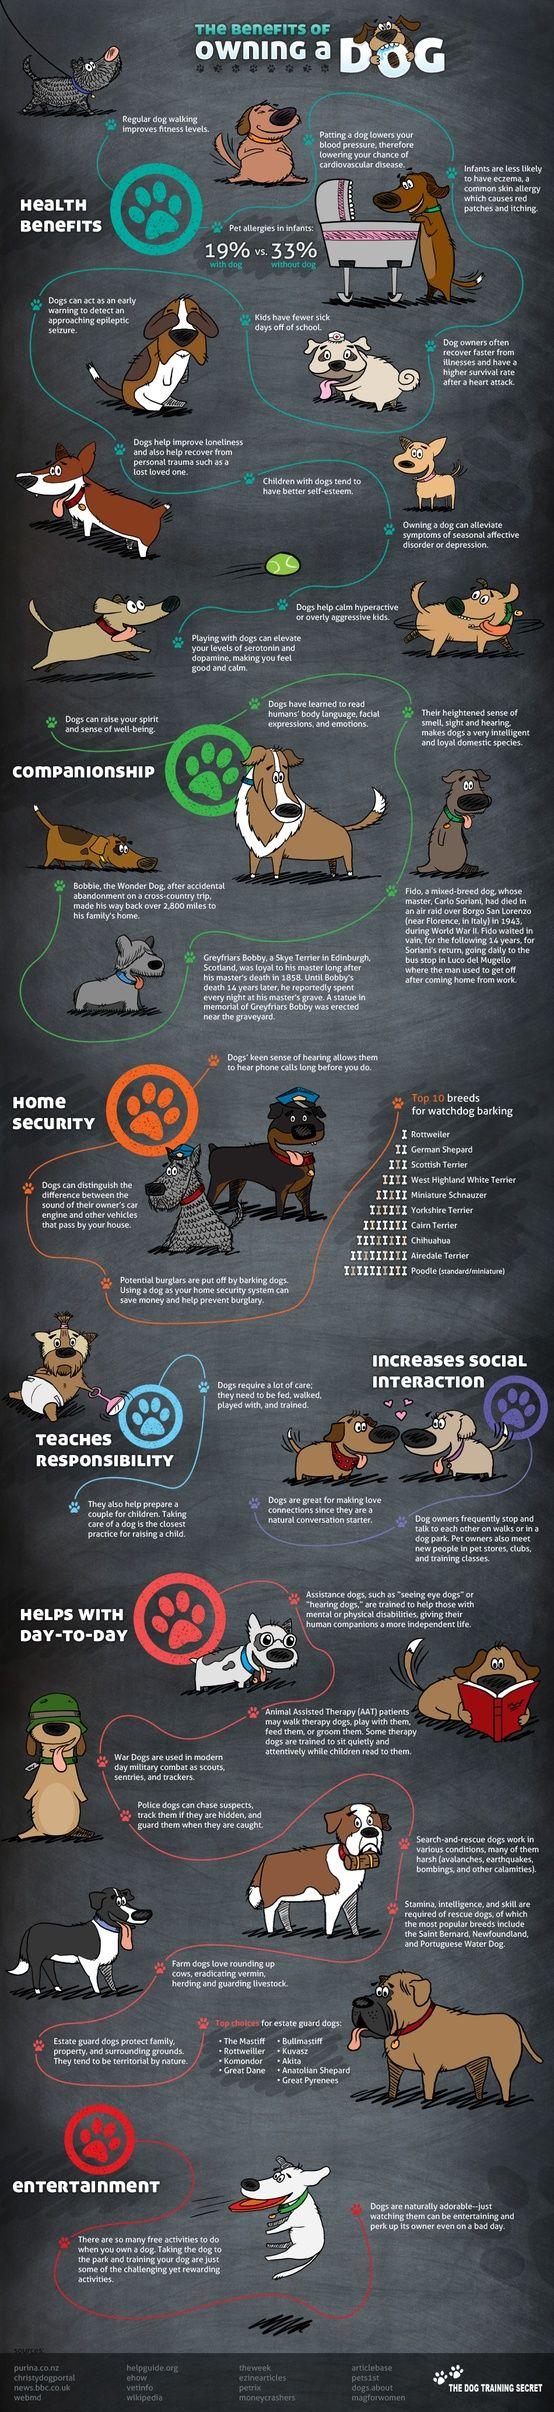 oscar the english bulldog